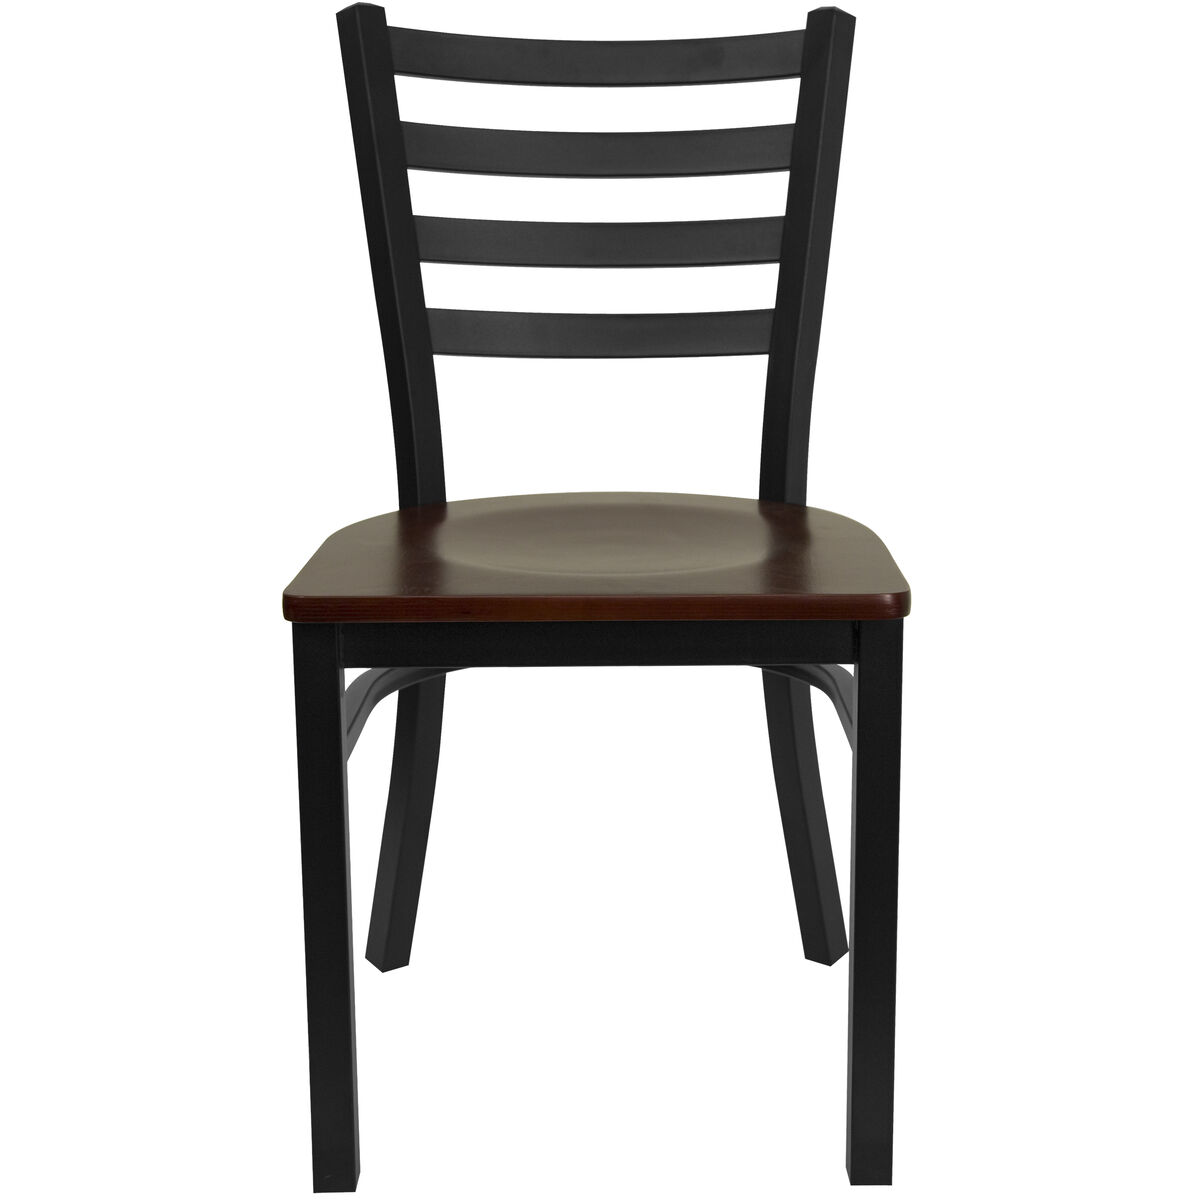 Black Ladder Chair Mah Seat Bfdh 6147ladmw Tdr